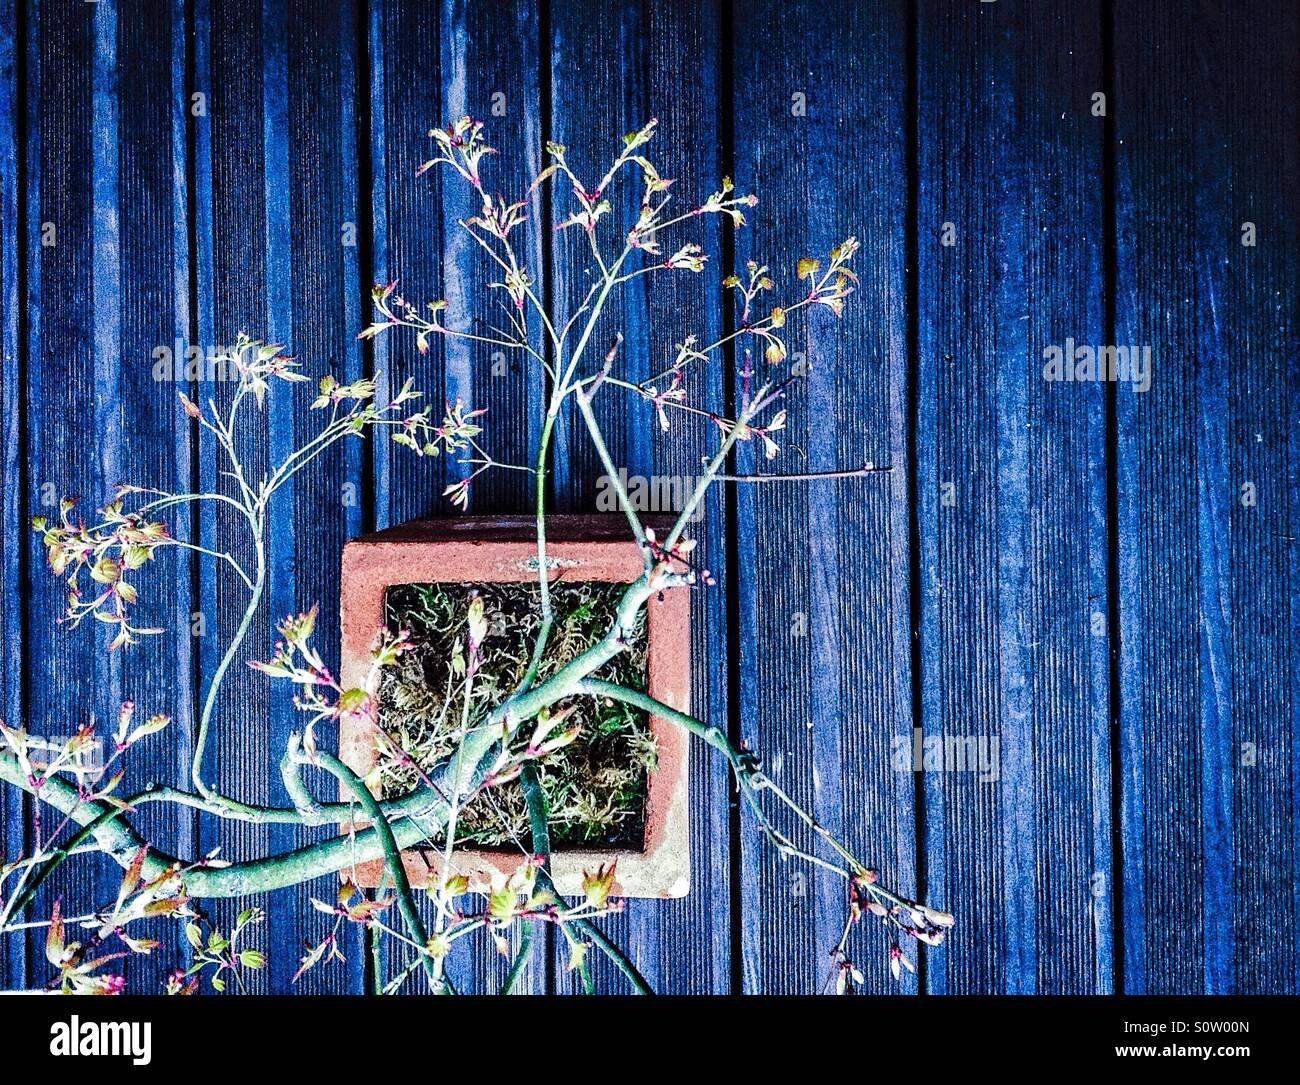 Japanese maple bonsai - Stock Image